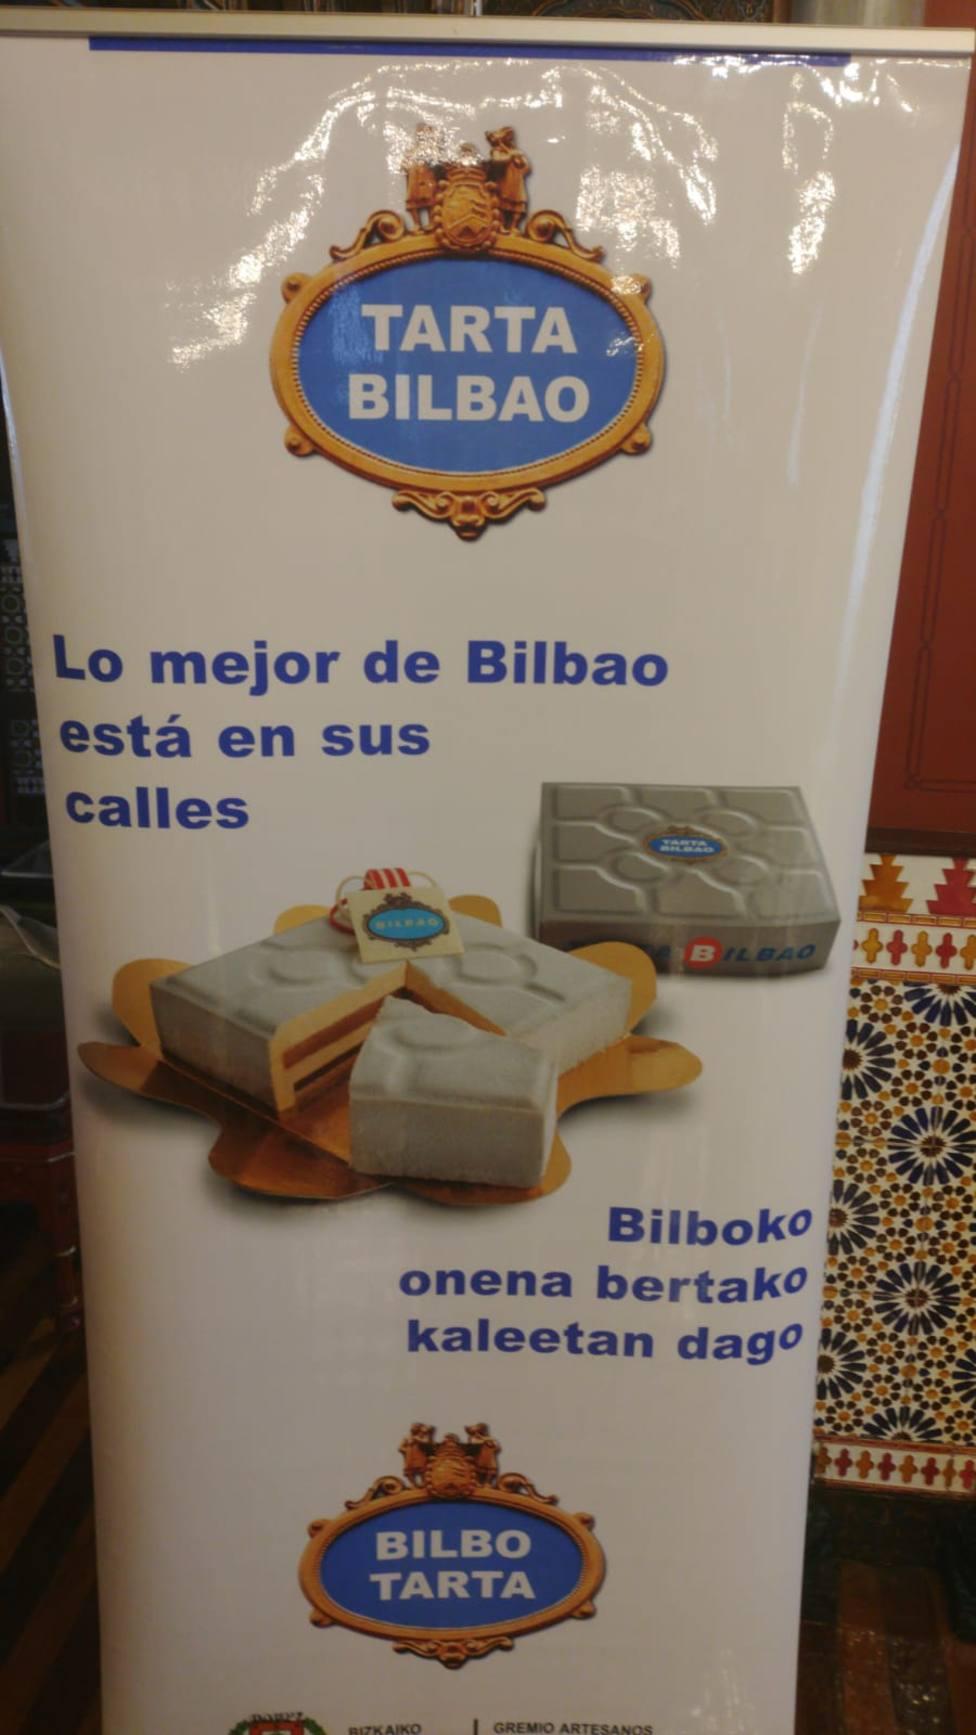 Bilbao cuenta con su propia tarta